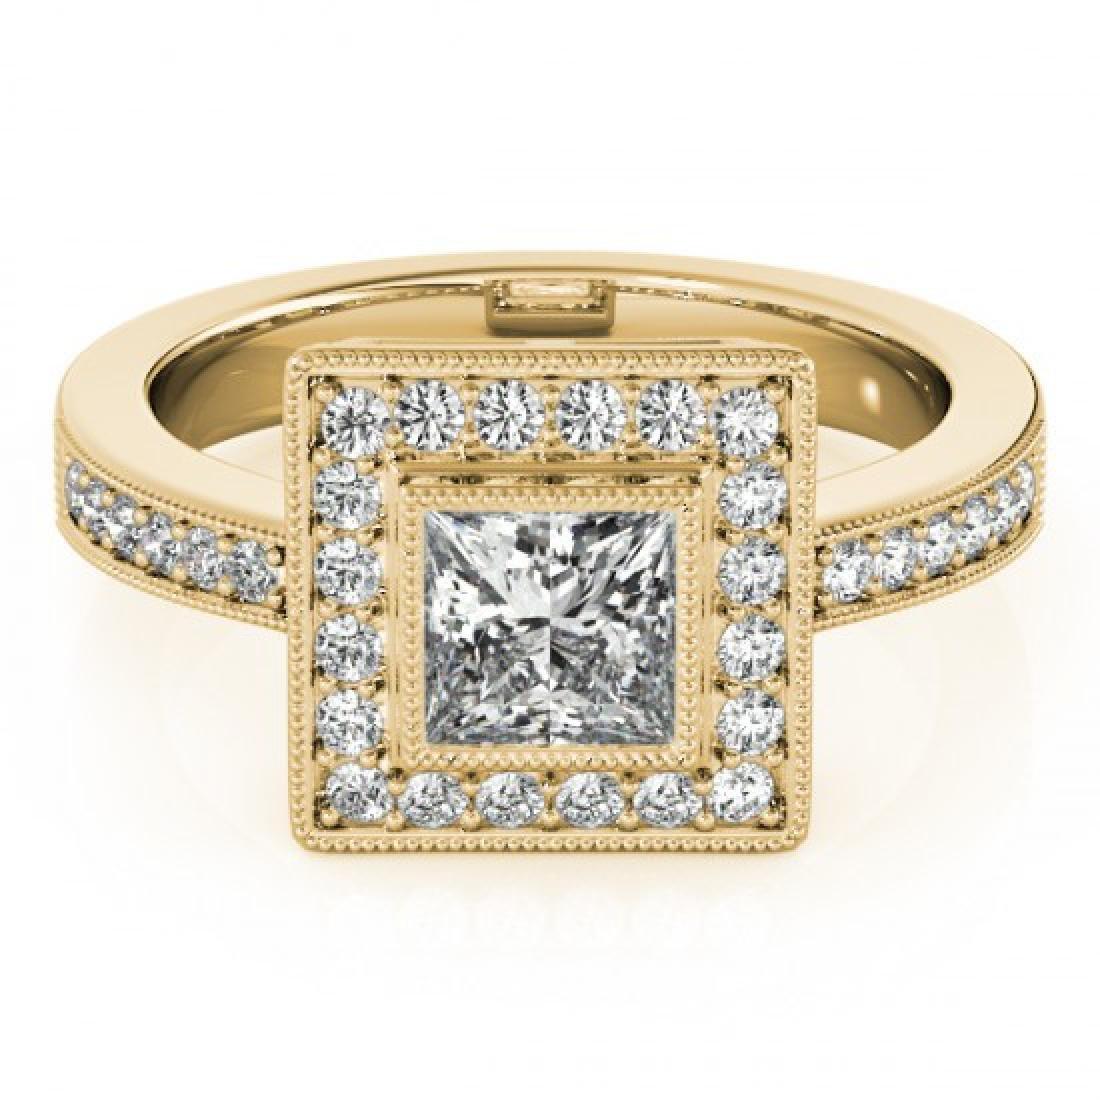 1.11 CTW Certified VS/SI Princess Diamond Solitaire